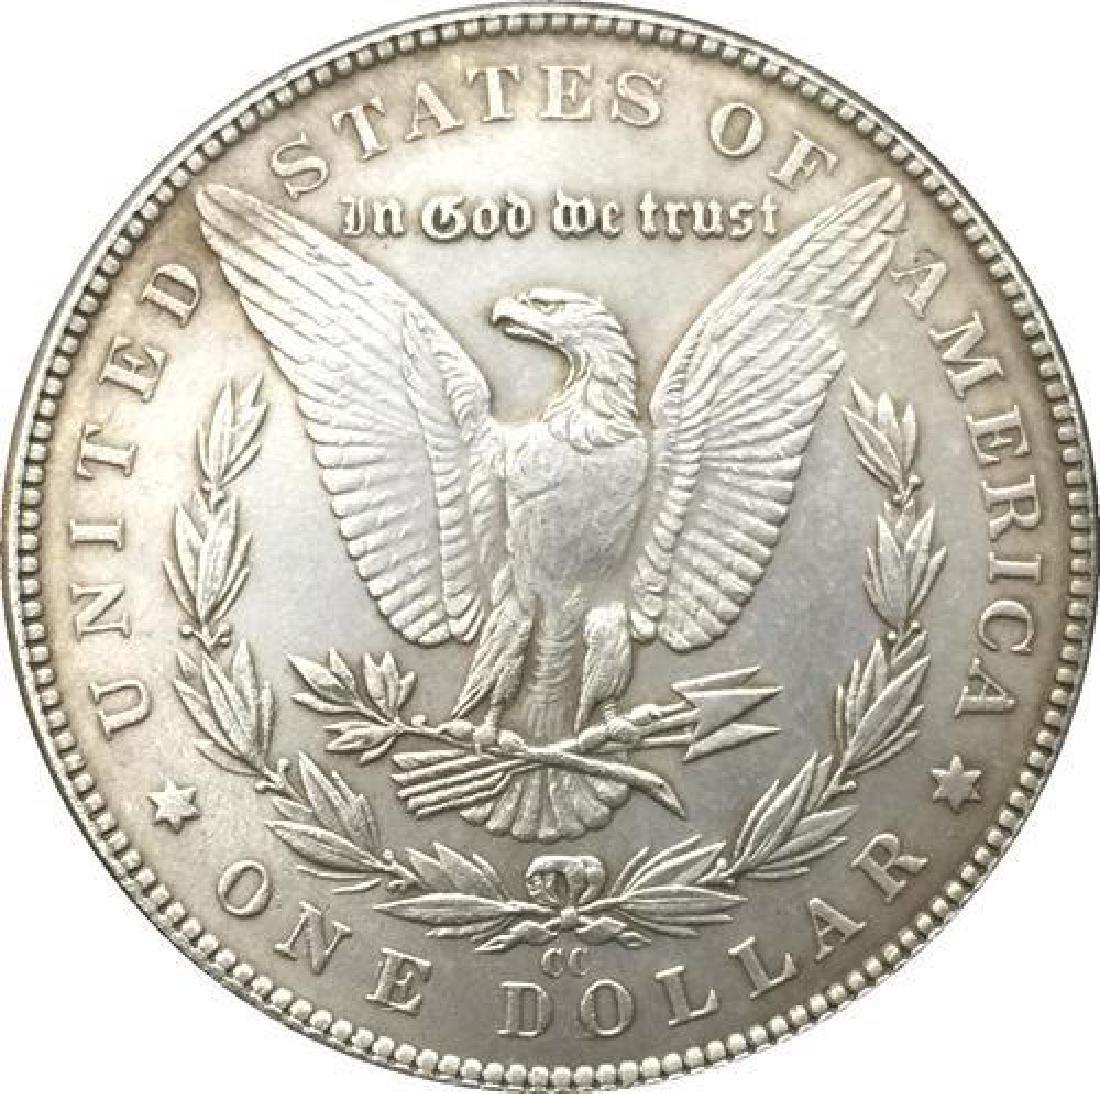 1881 USA Captain Pirate Skull Coin - 2